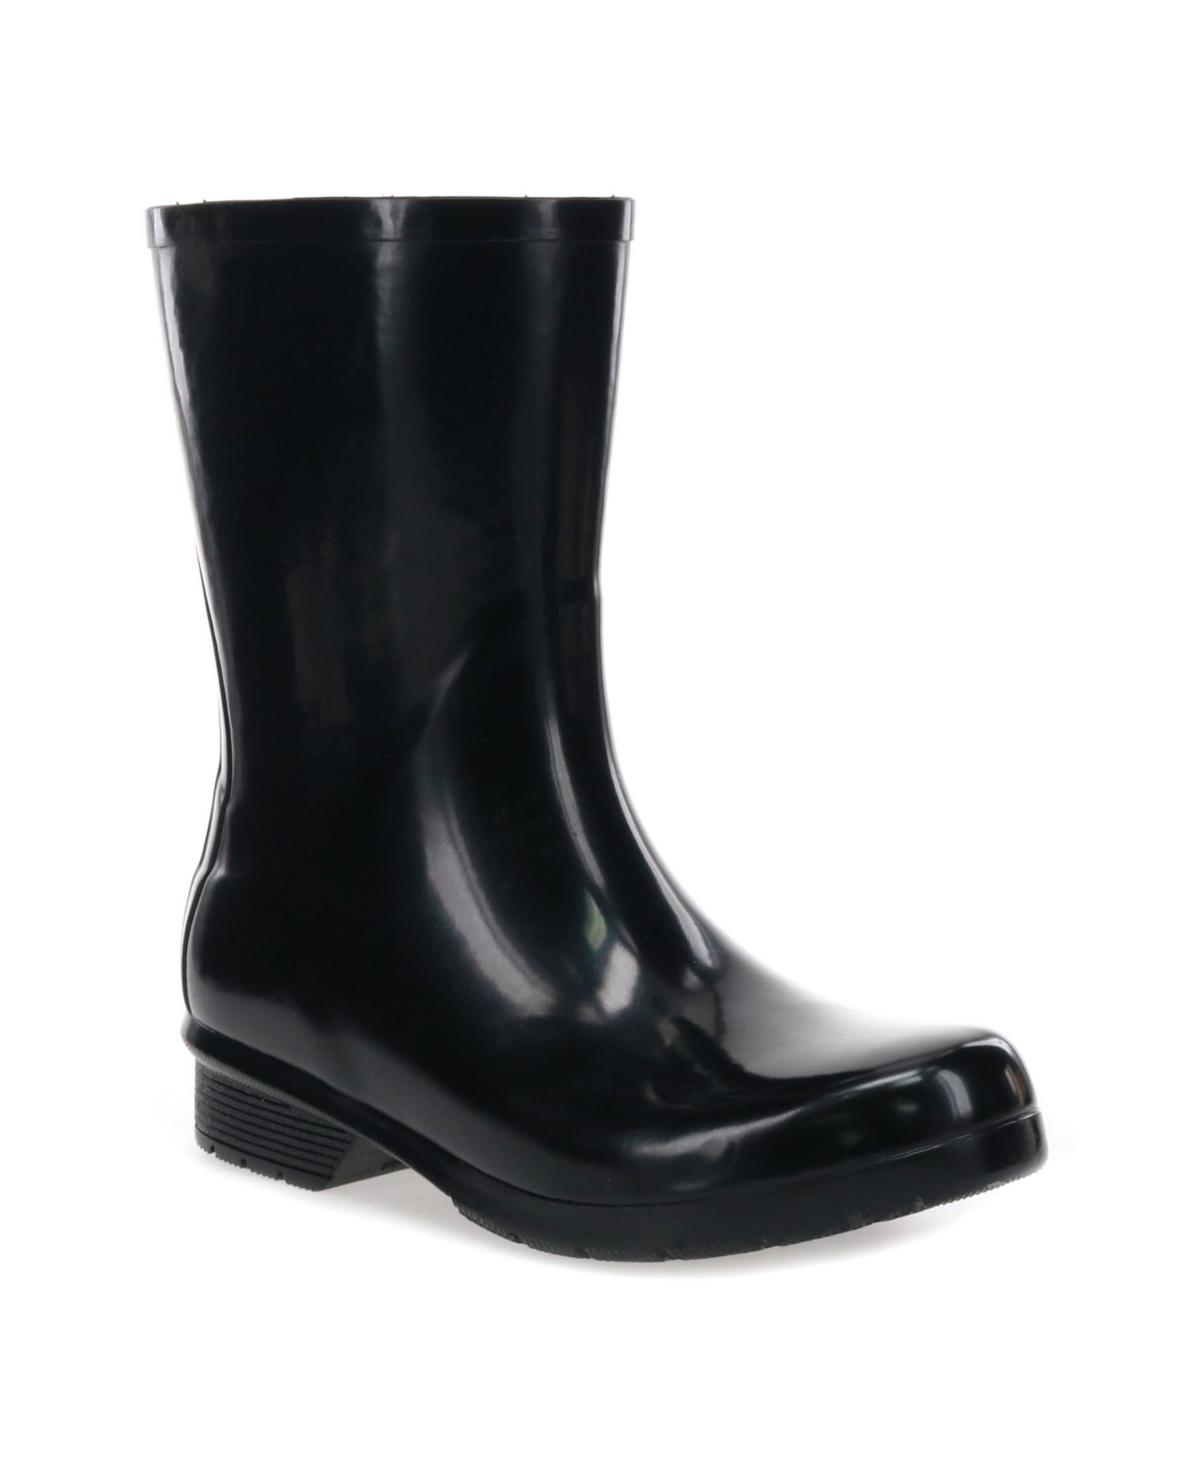 Chooka Women's Polished Waterproof Rain Boots Women's Shoes